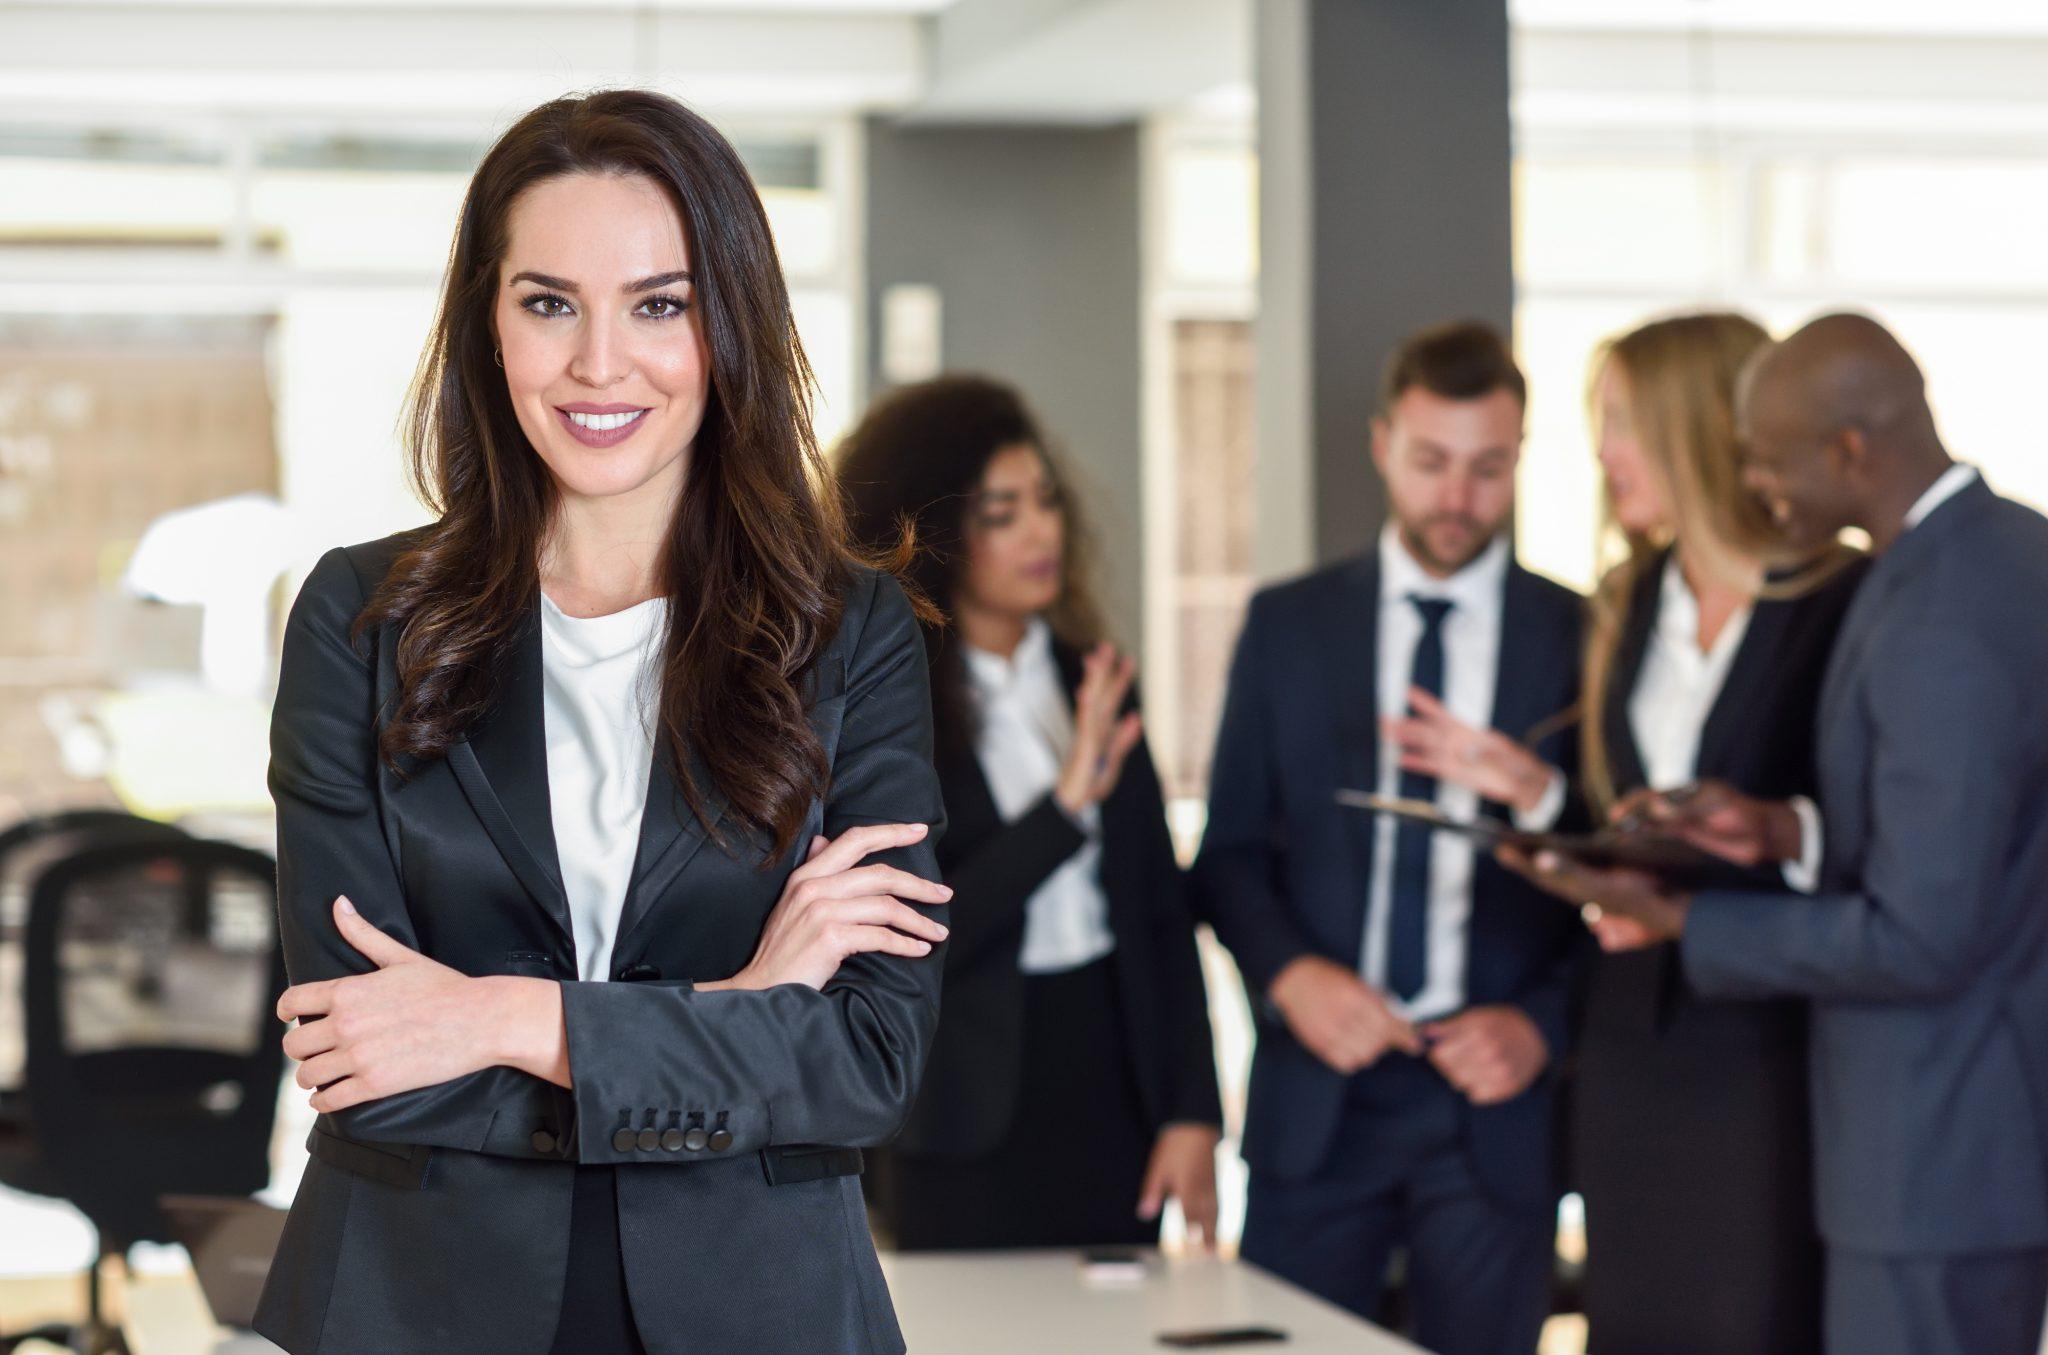 Bayer se compromete a aumentar número de mulheres líderes